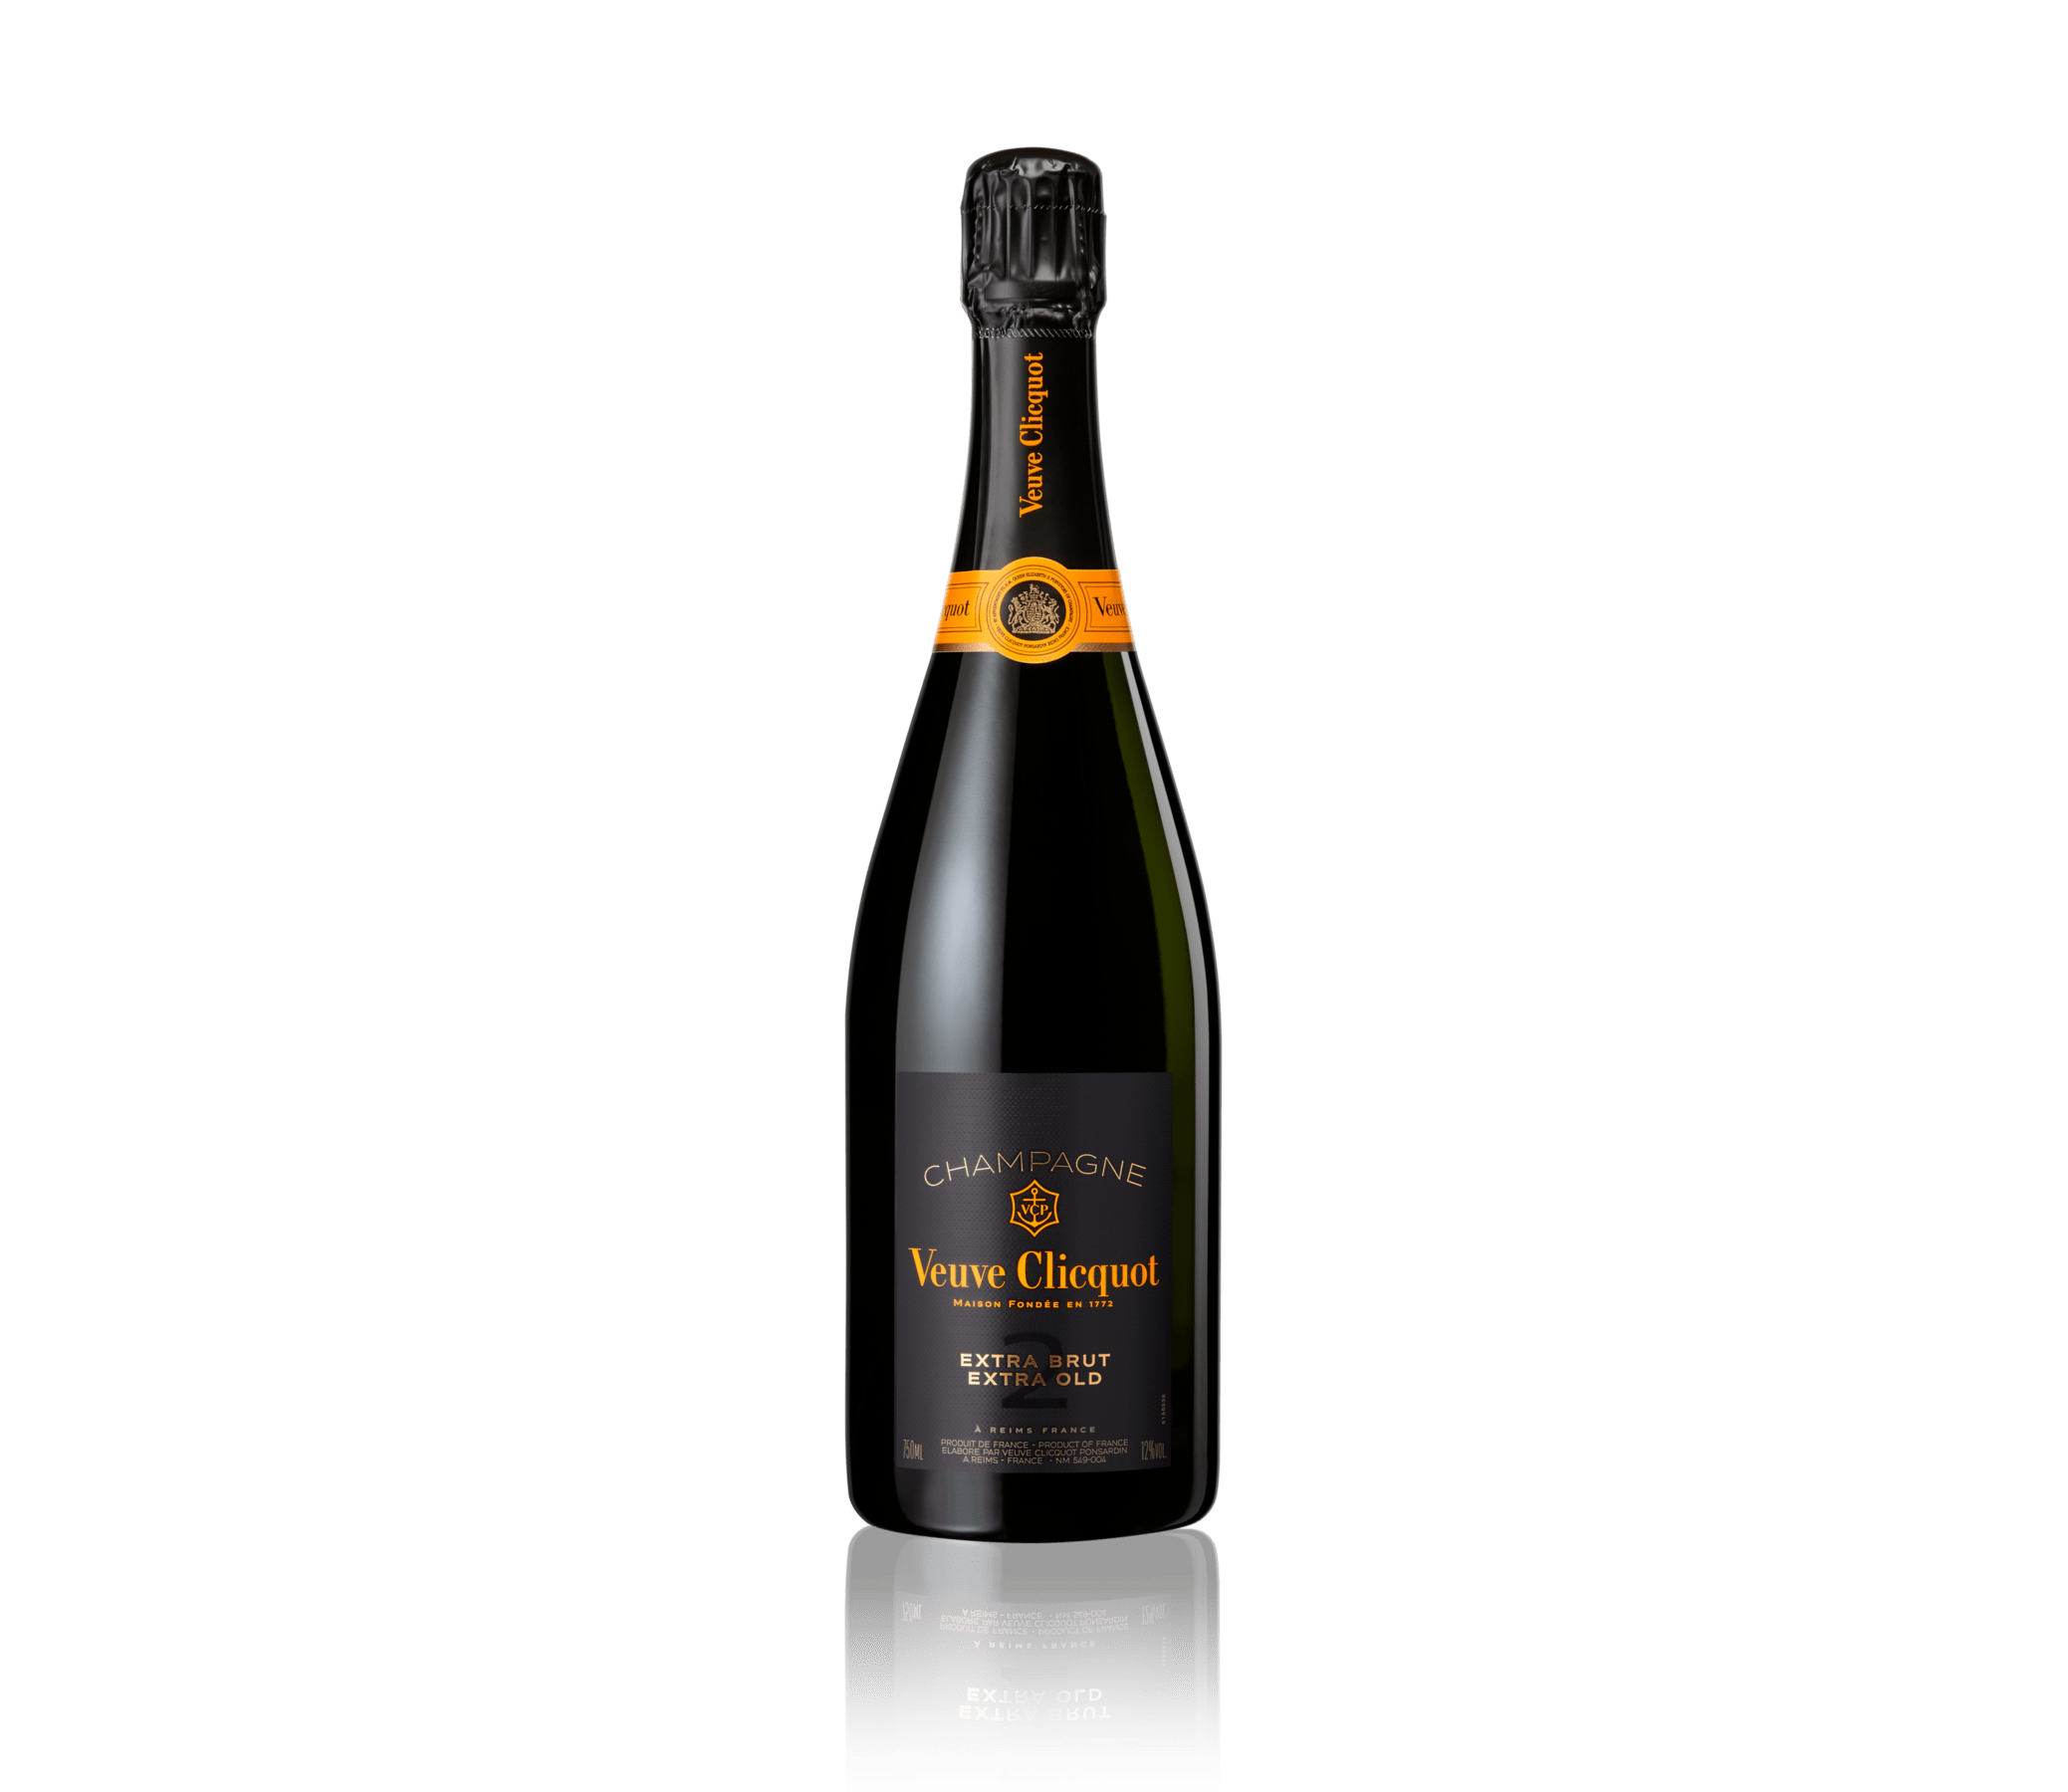 Bouteille de Champagne Veuve Clicquot Extra Brut Extra Old 2